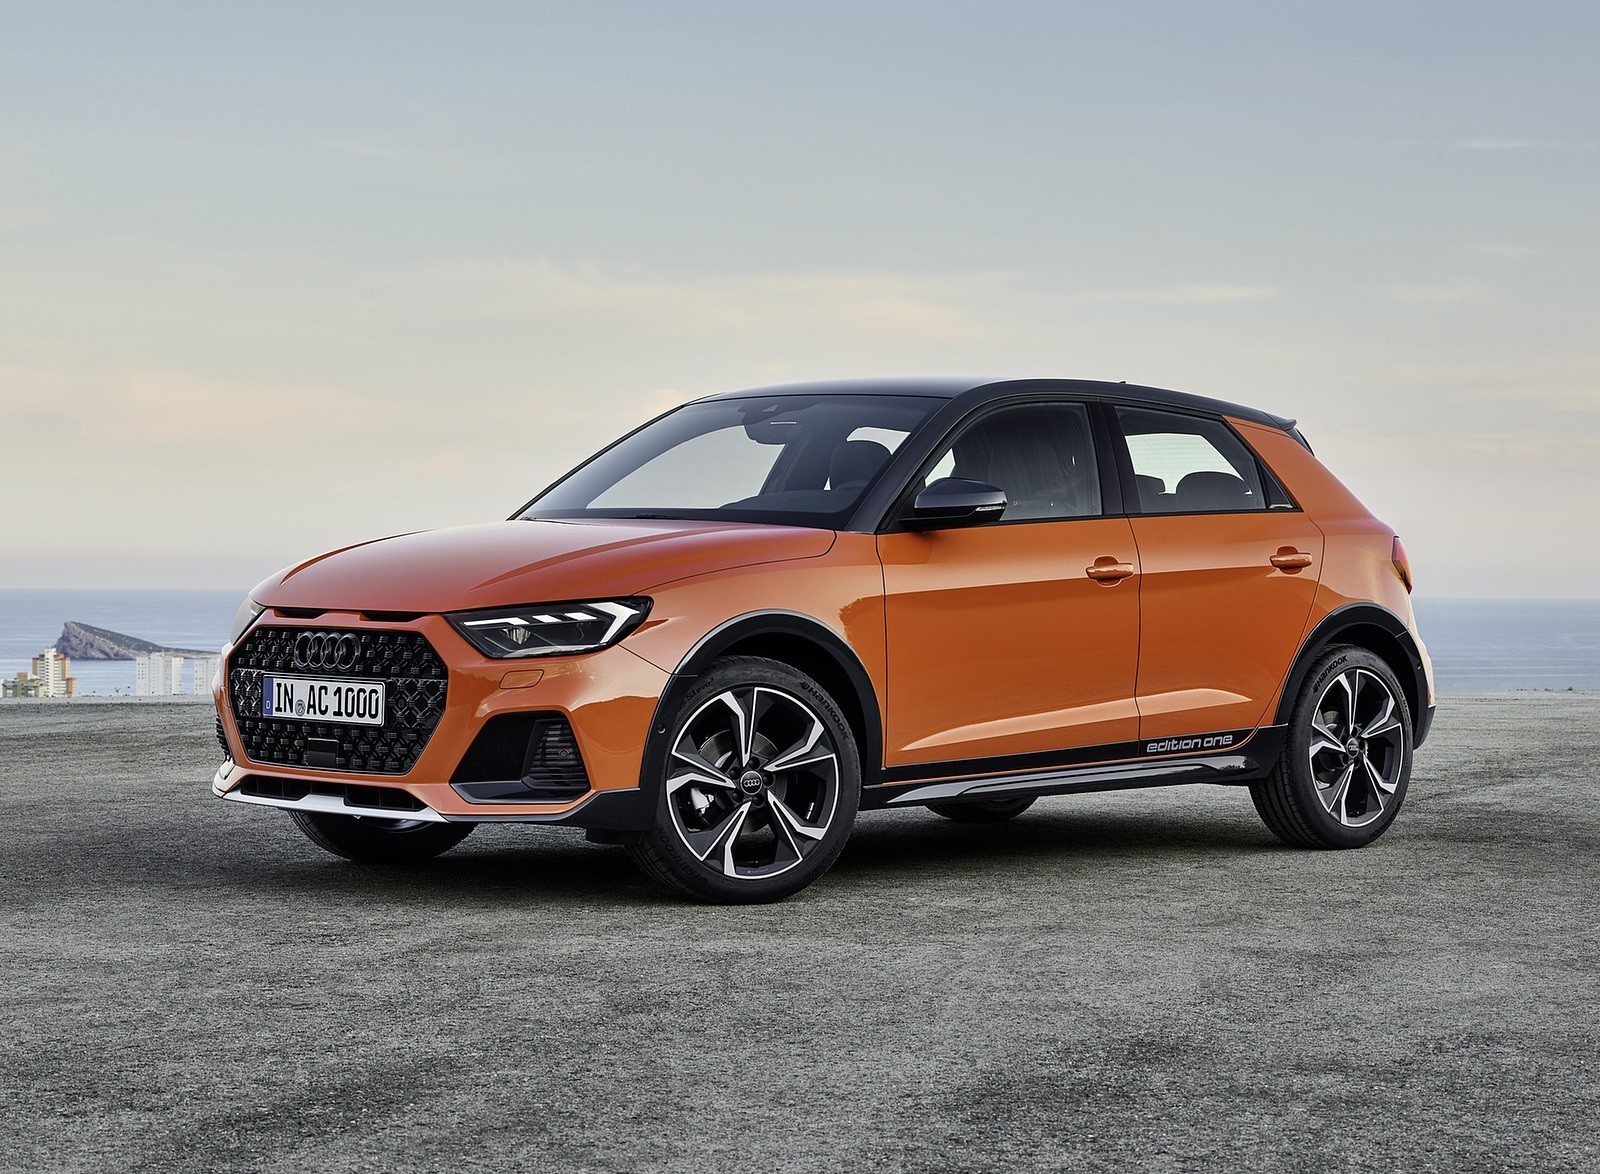 2020 Audi A1 Citycarver (Color: Pulse Orange) Front Three-Quarter Wallpapers (10)